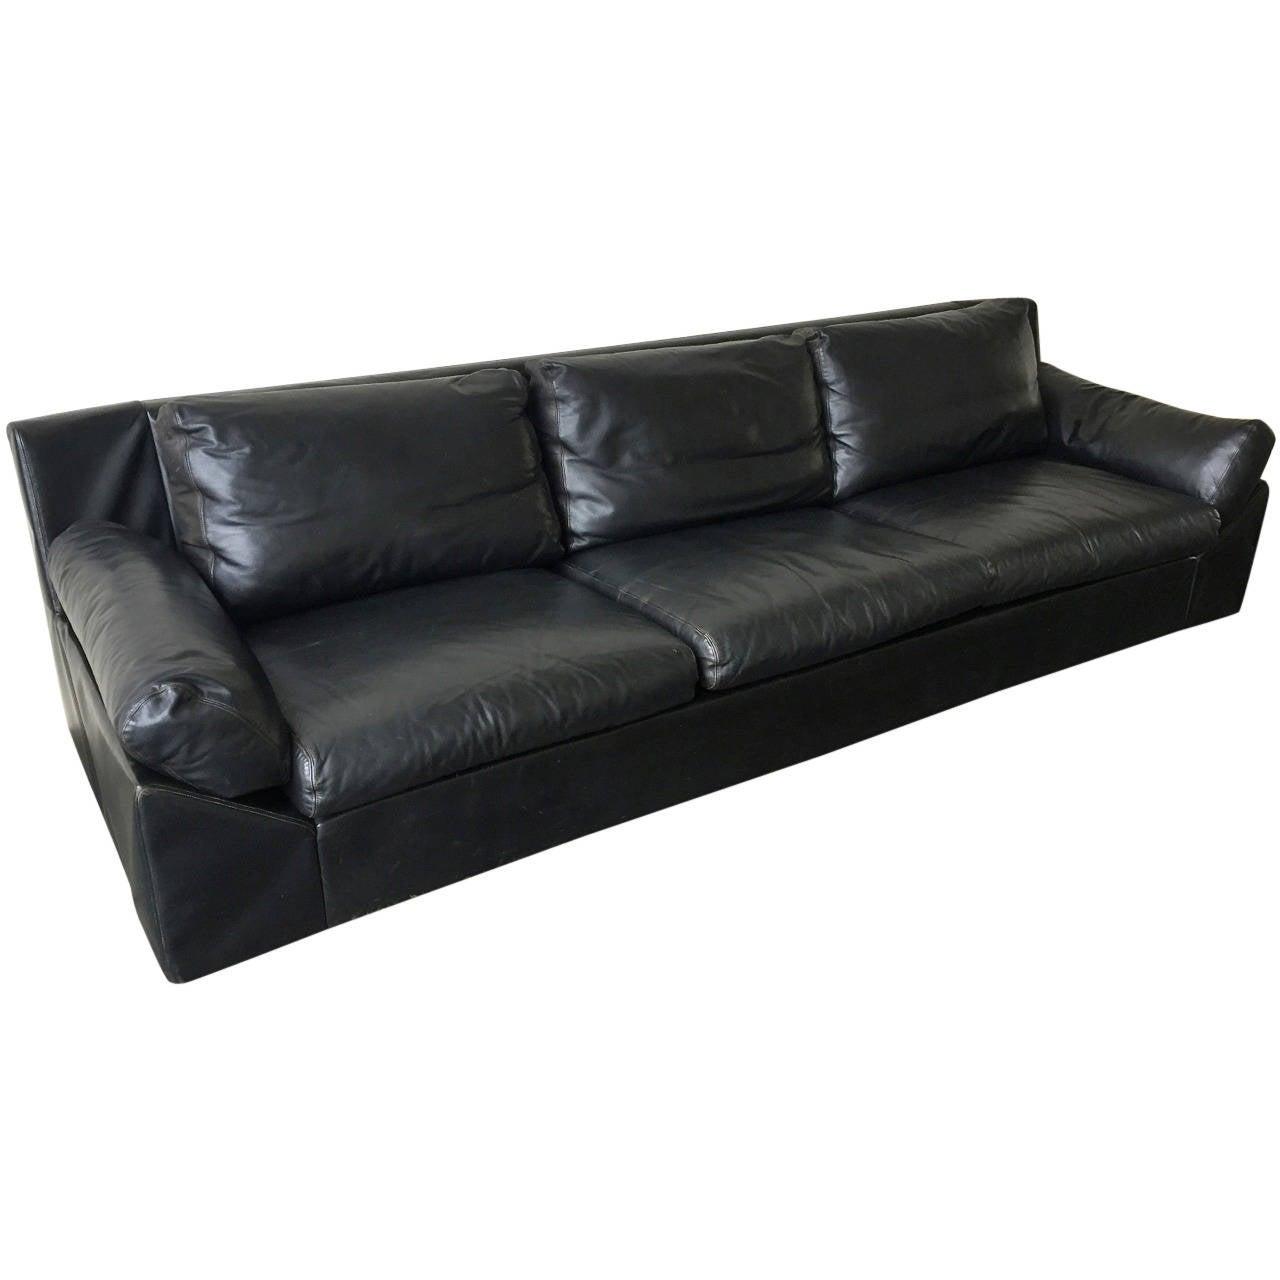 California Sofa by Edelhard Harlis